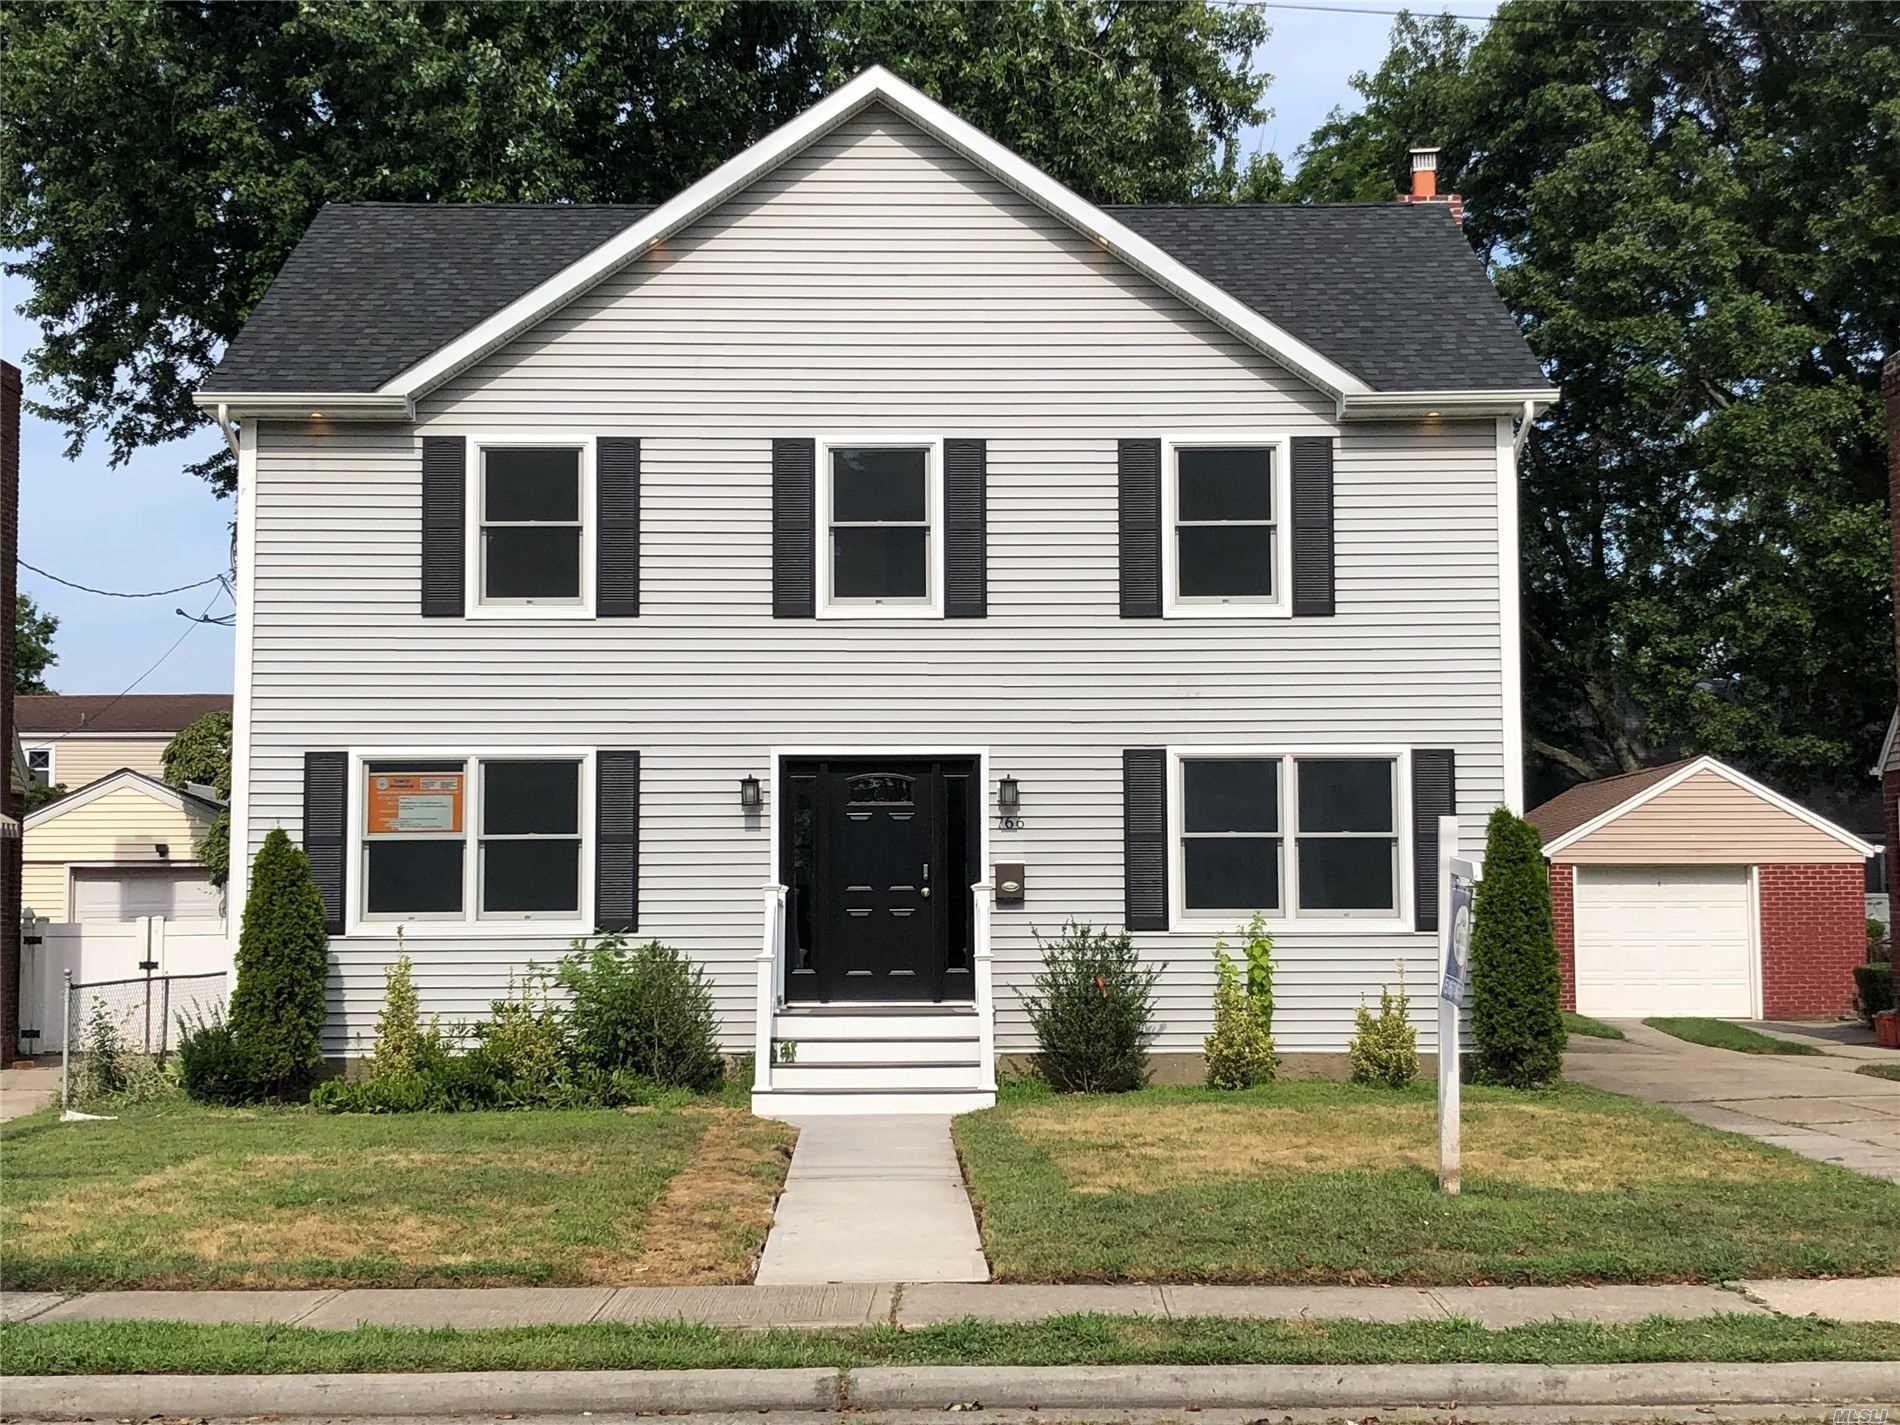 766 Harrison St W. Hempstead, NY 11552